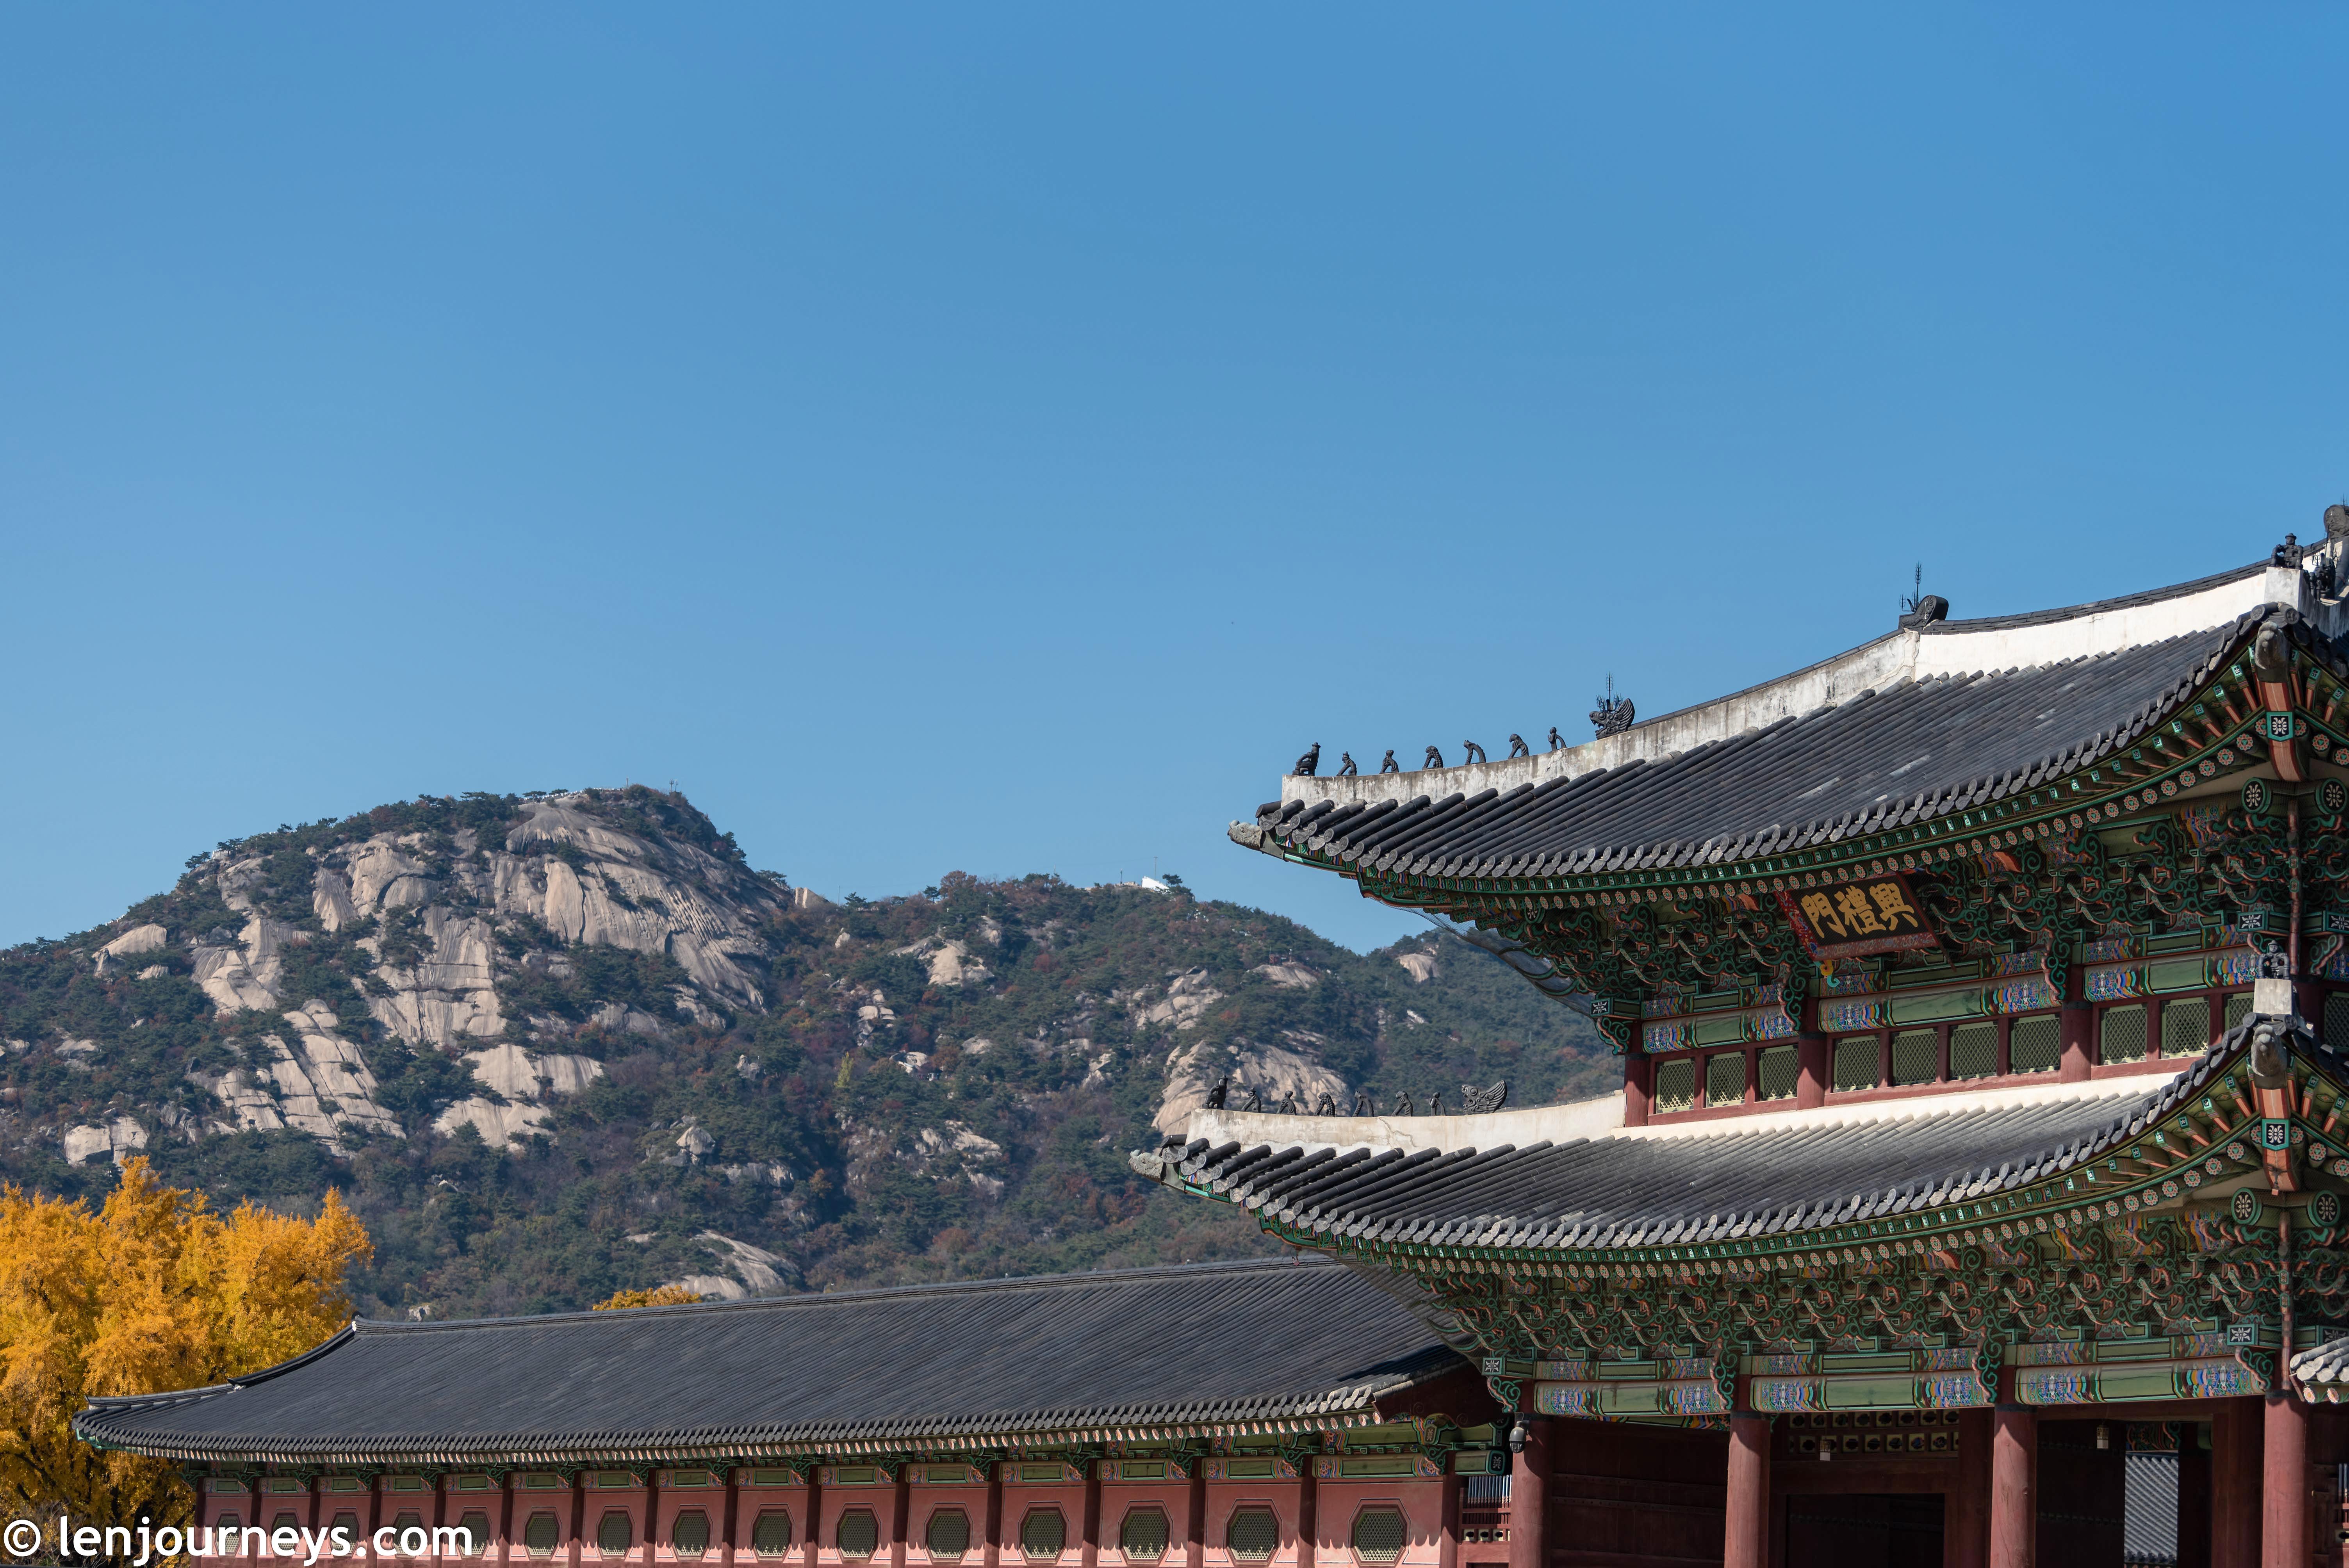 Gyeongbokgung with Mount Bugaksan as backdrop